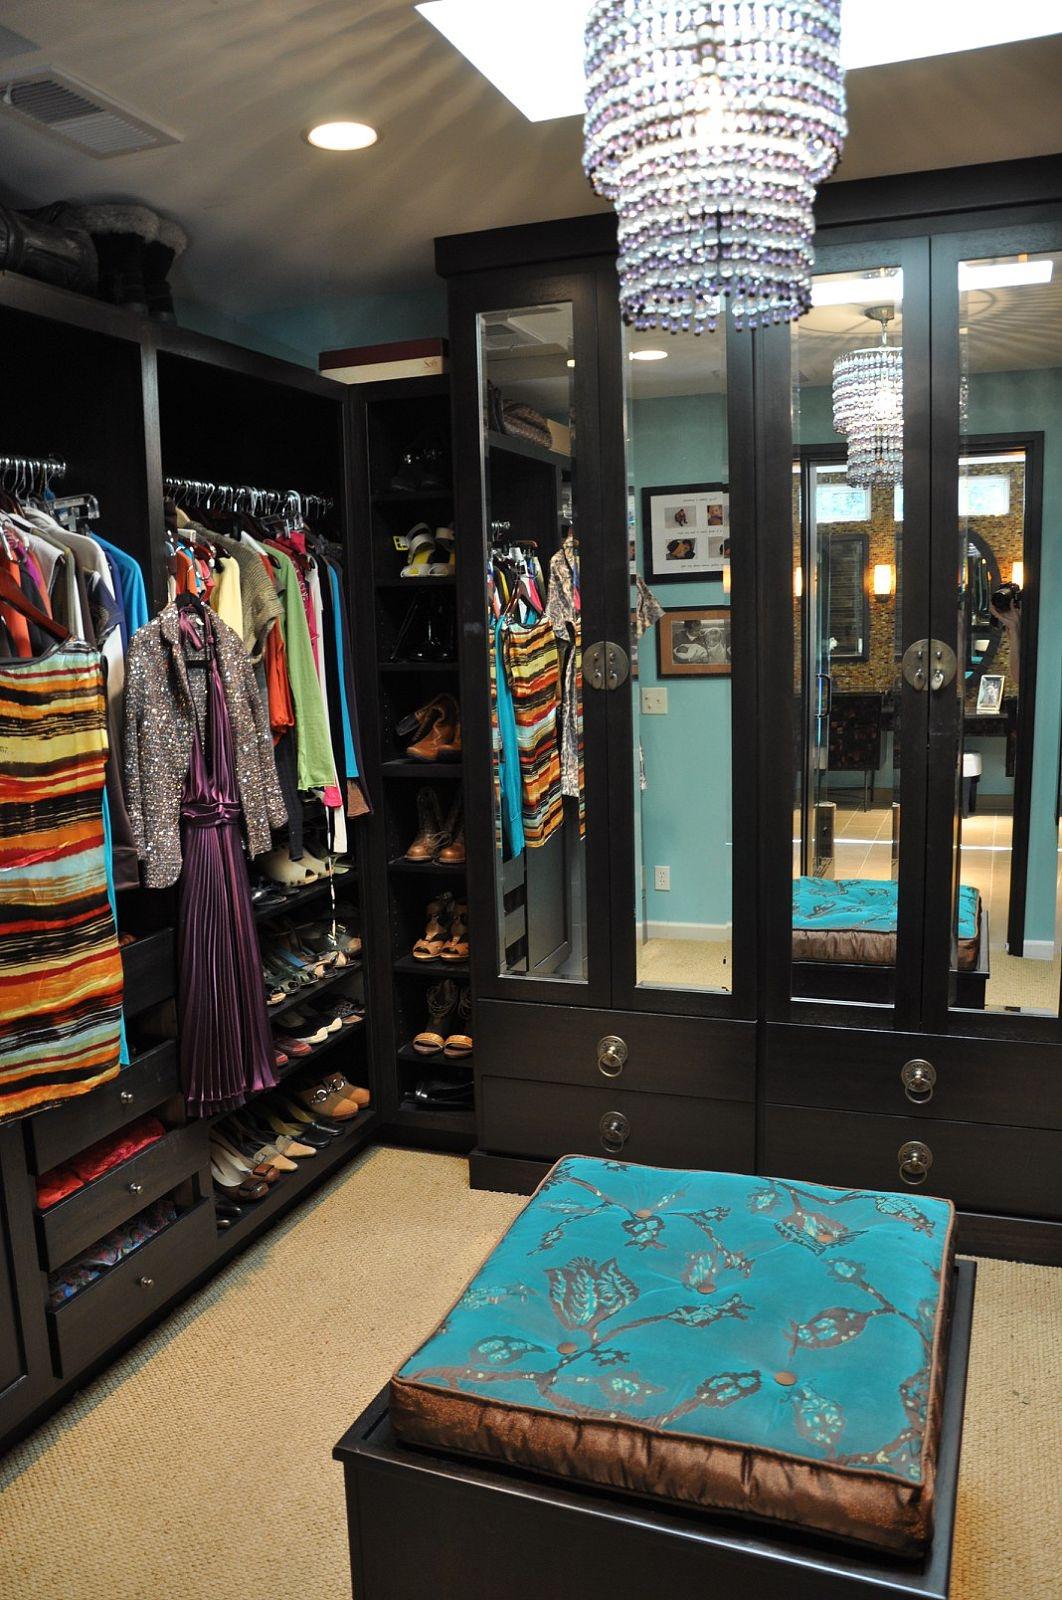 Colorful organized closet space